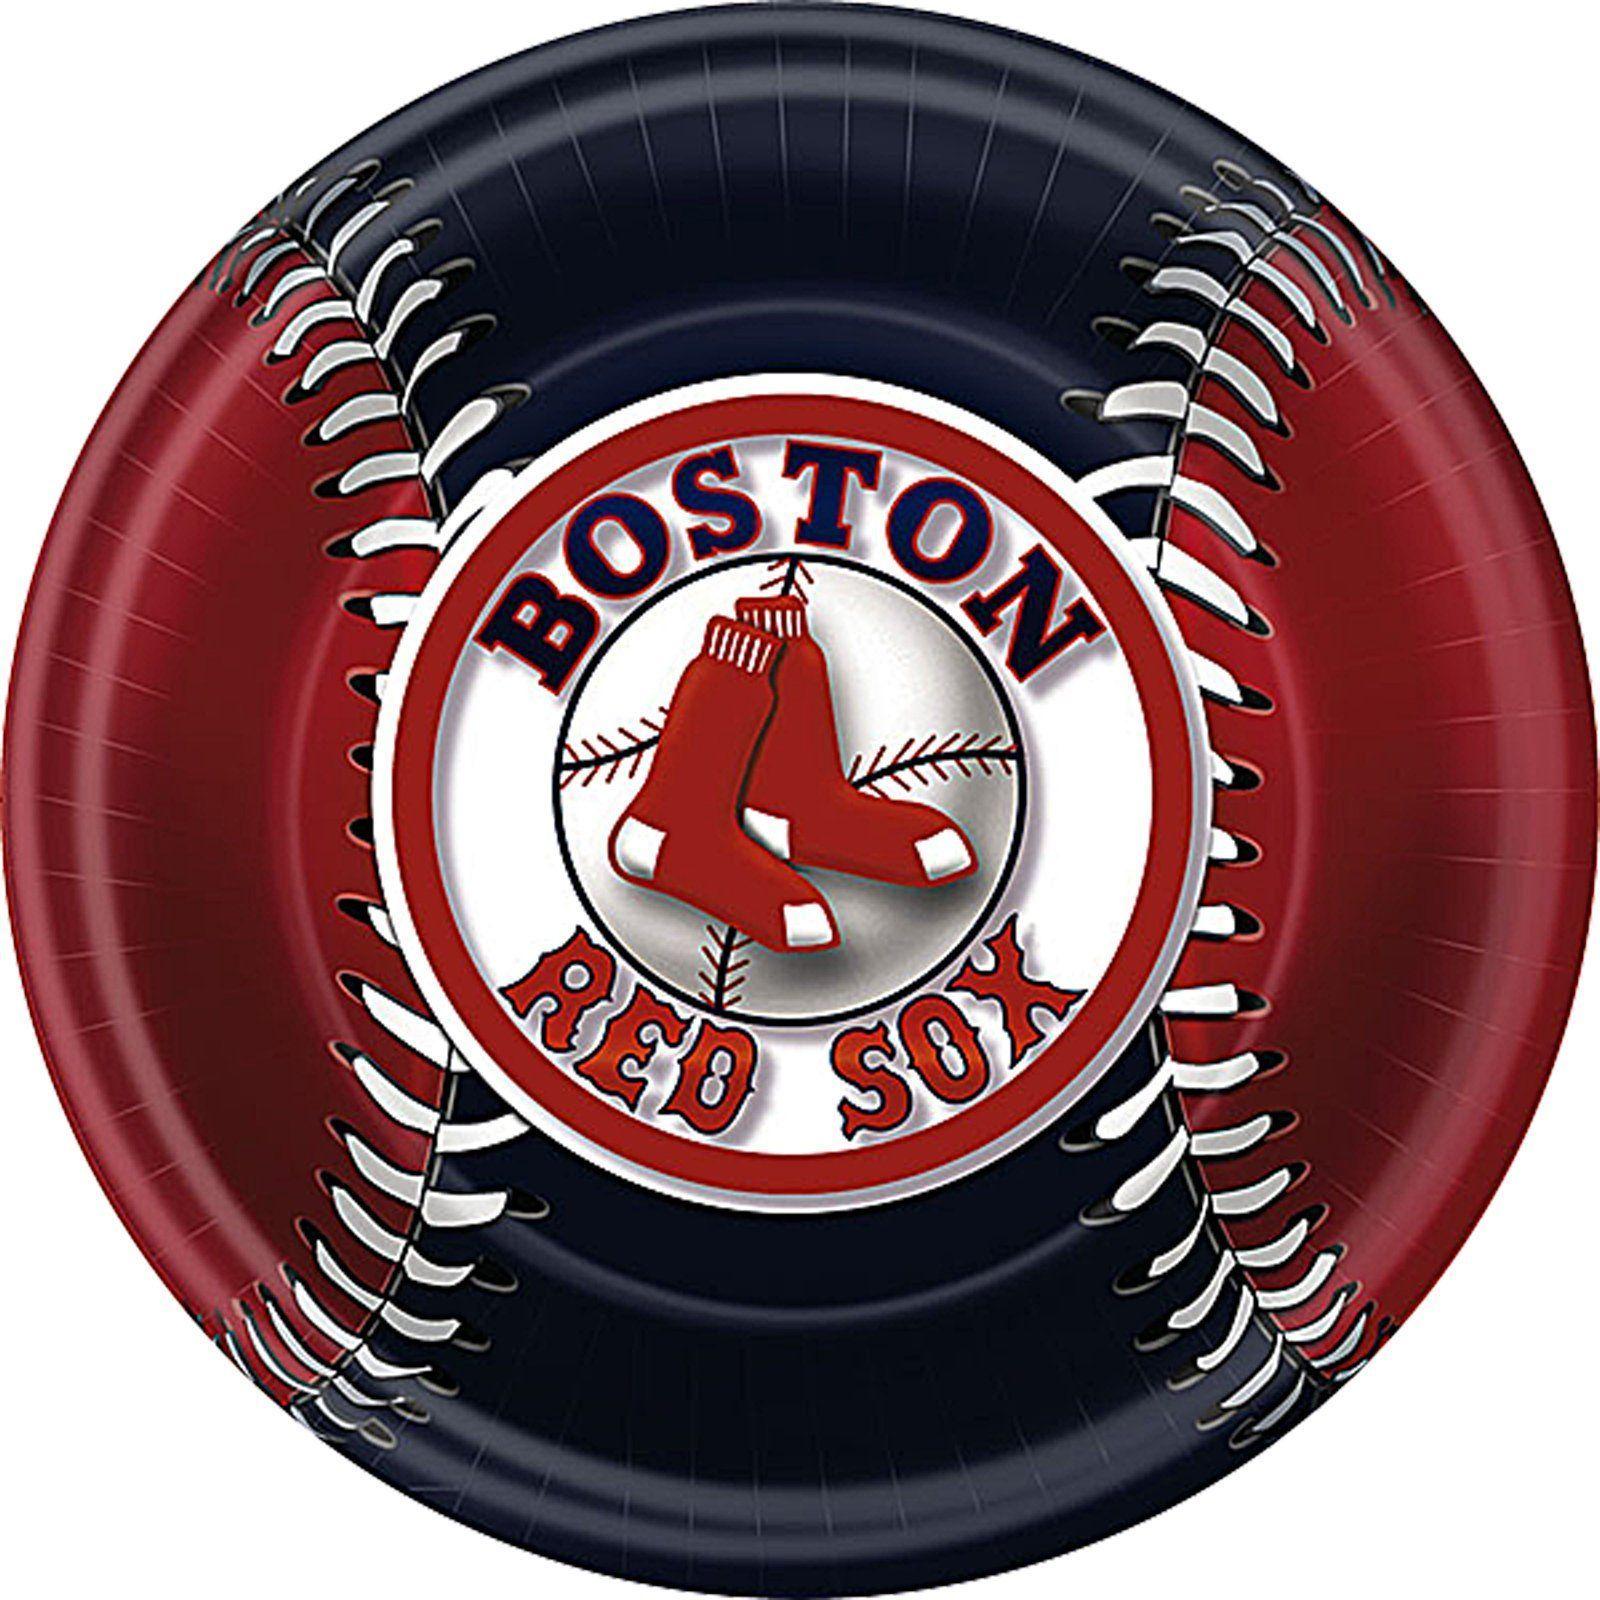 boston red sox boston red sox logo ball HD Wallpaper